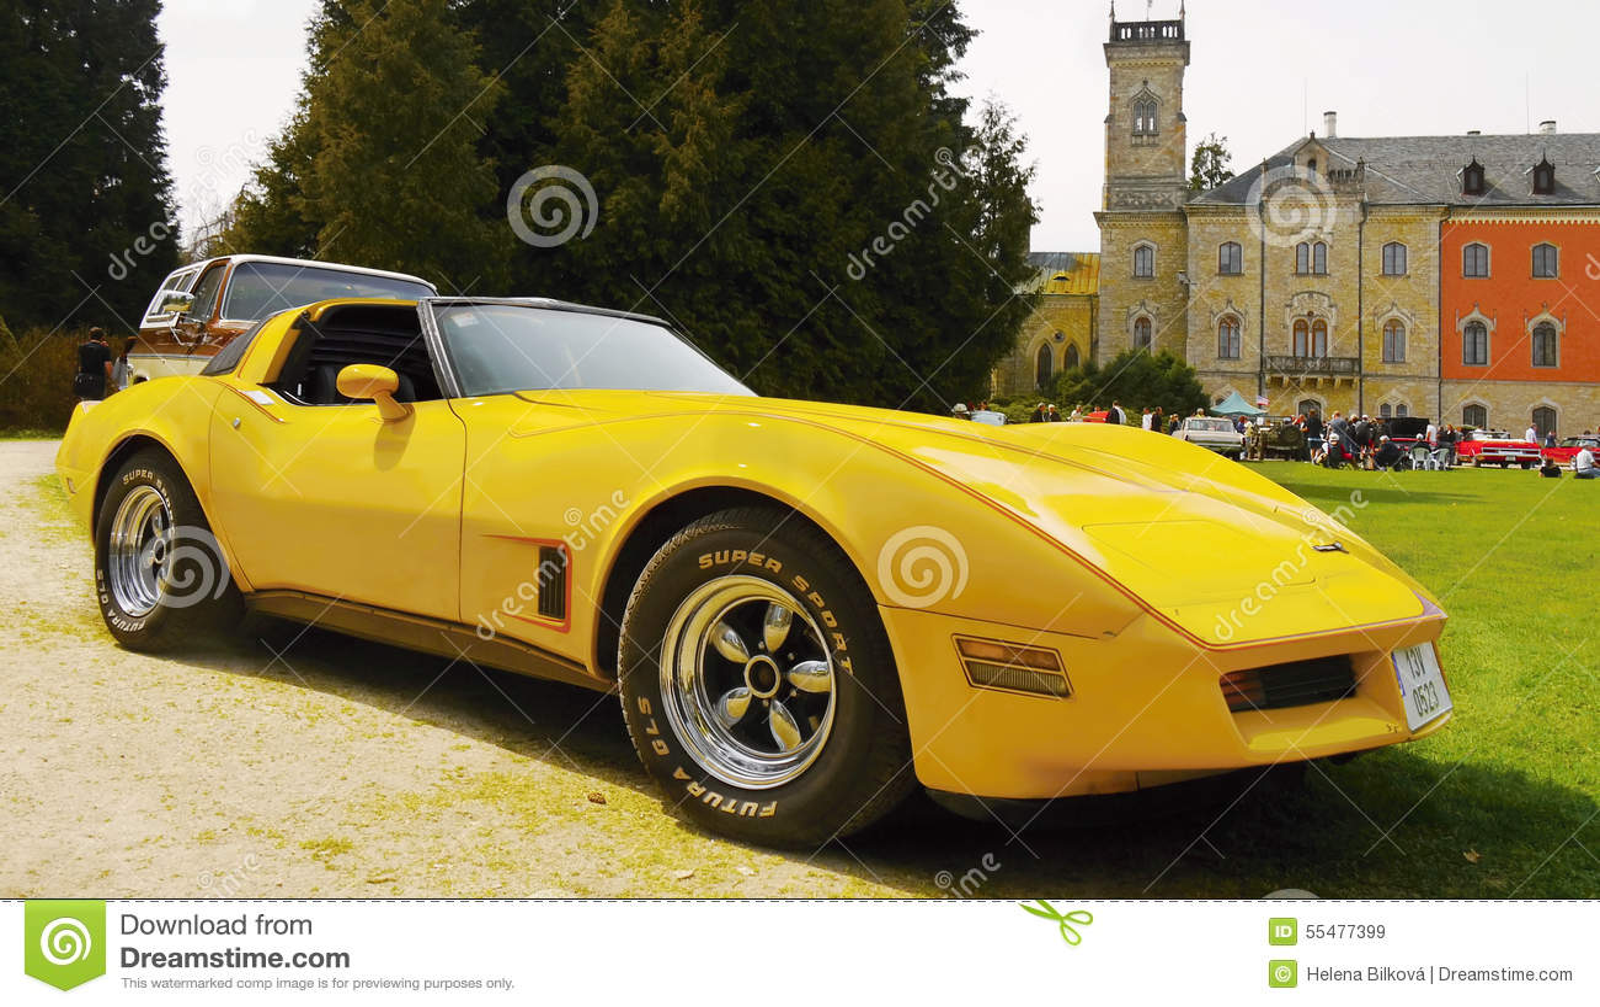 Chevrolet Corvette Sports Car Editorial Stock Image